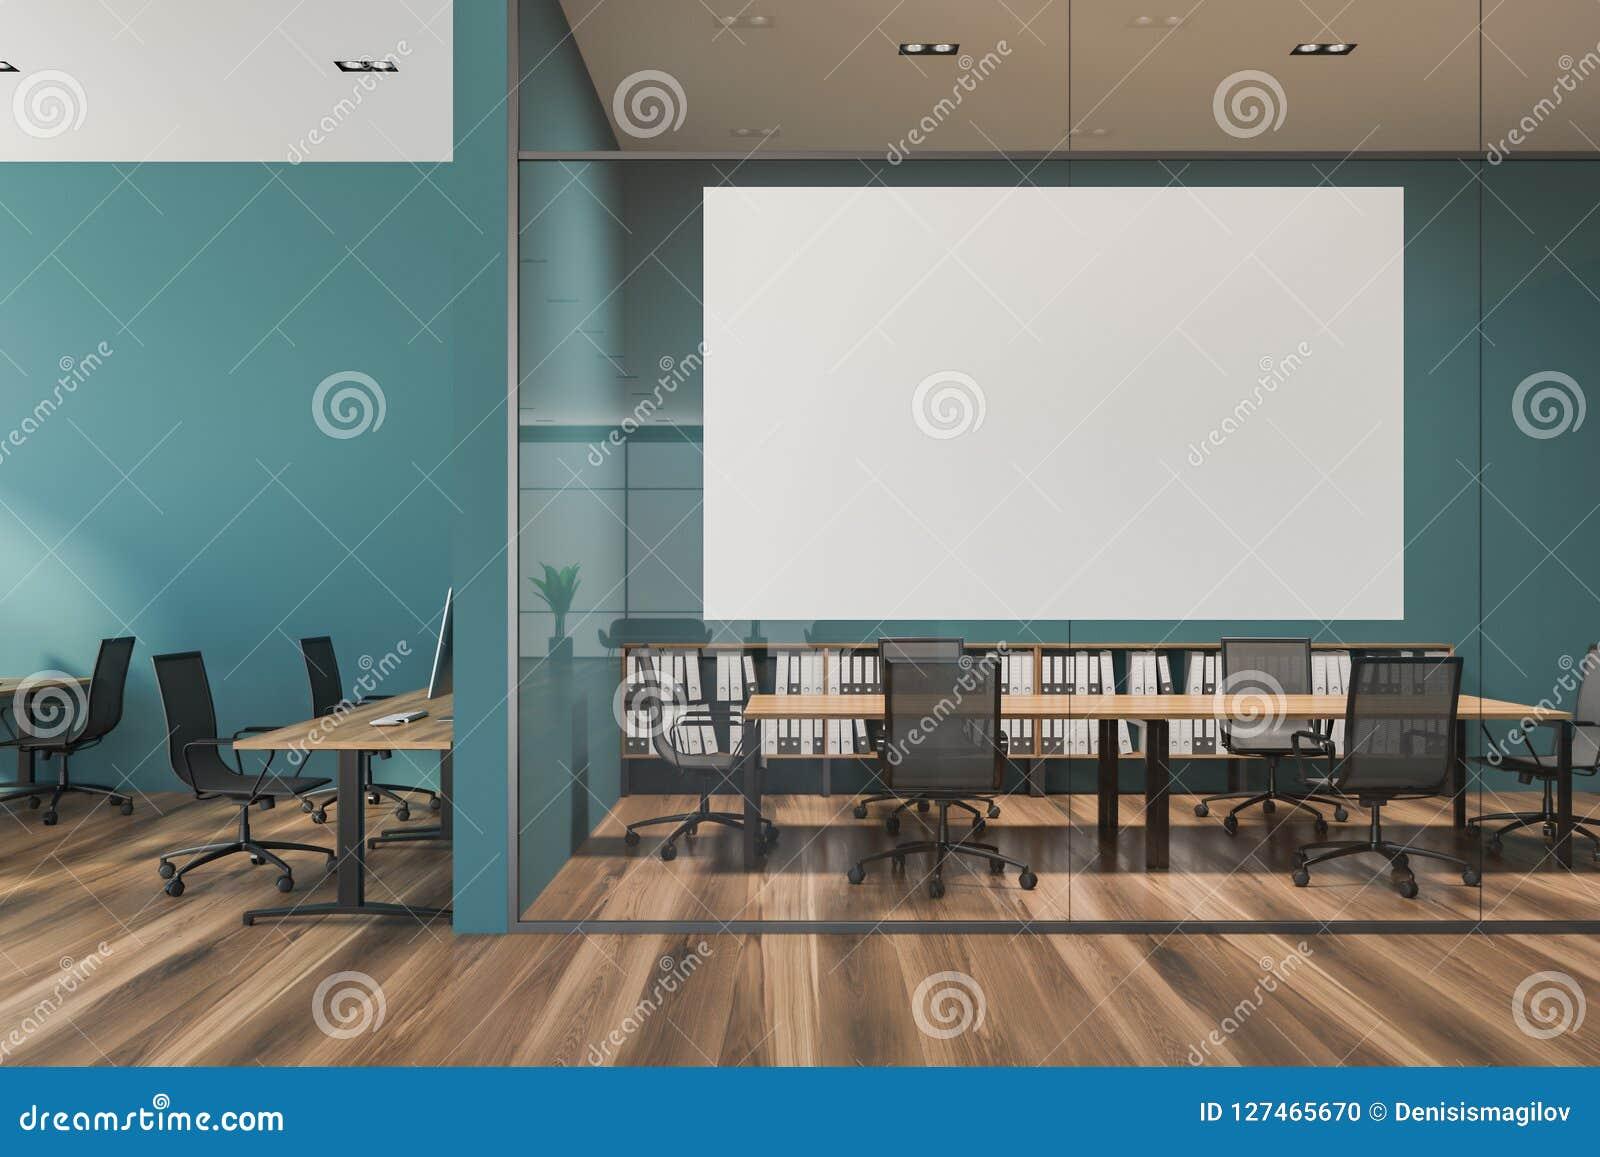 Blue Office Meeting Room Glass Walls Poster Stock Illustration Illustration Of Finance Modern 127465670